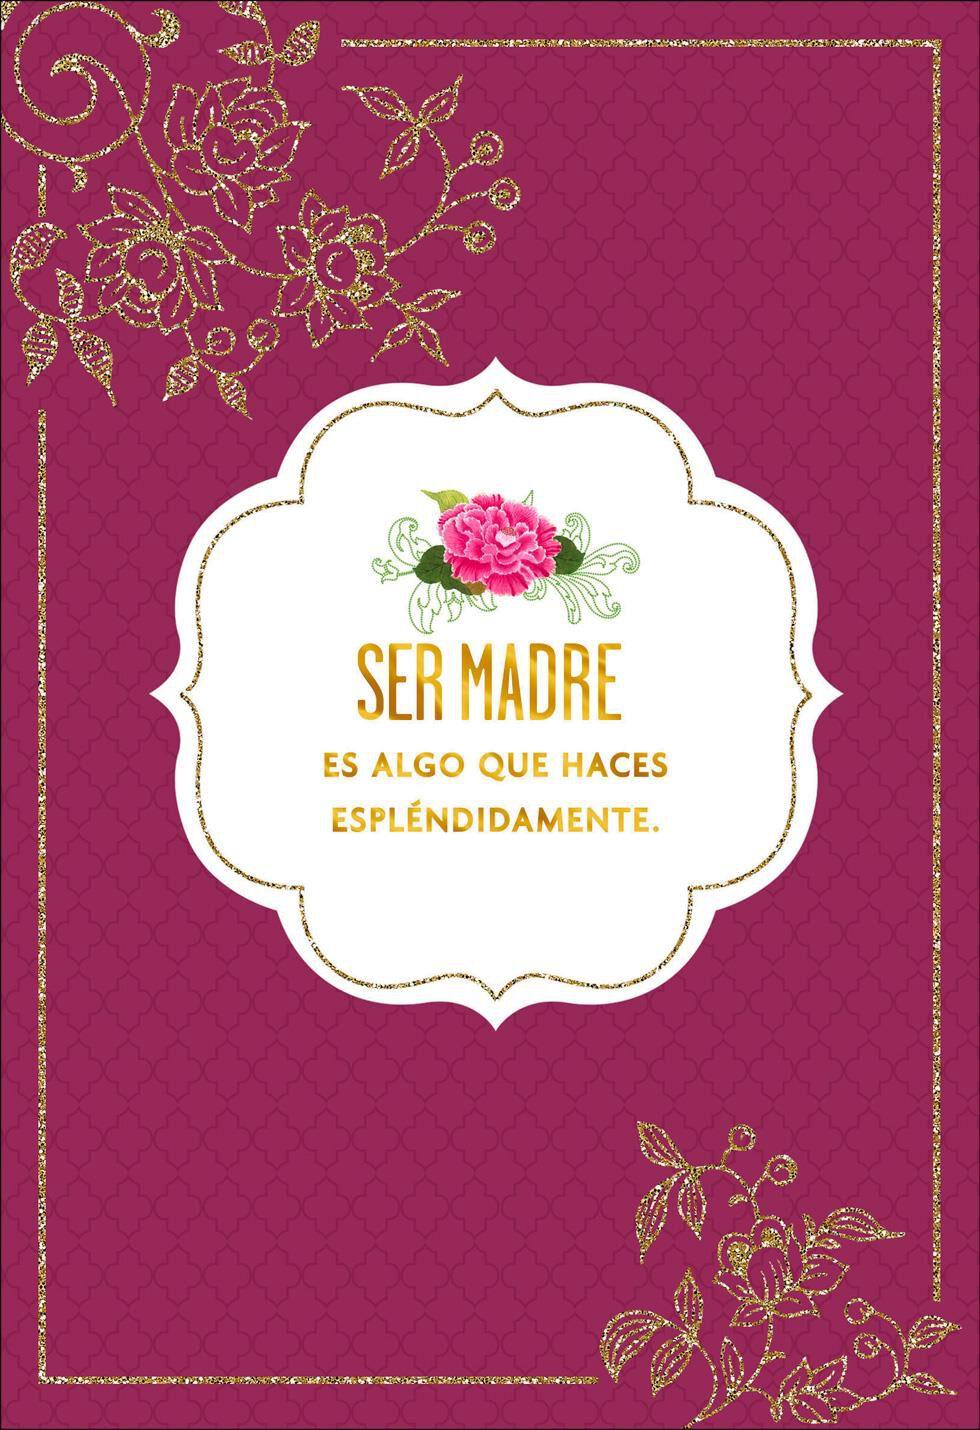 Floral Sparkles Spanish Language Birthday Card For Mom Greeting Cards Hallmark Jpg 444x648